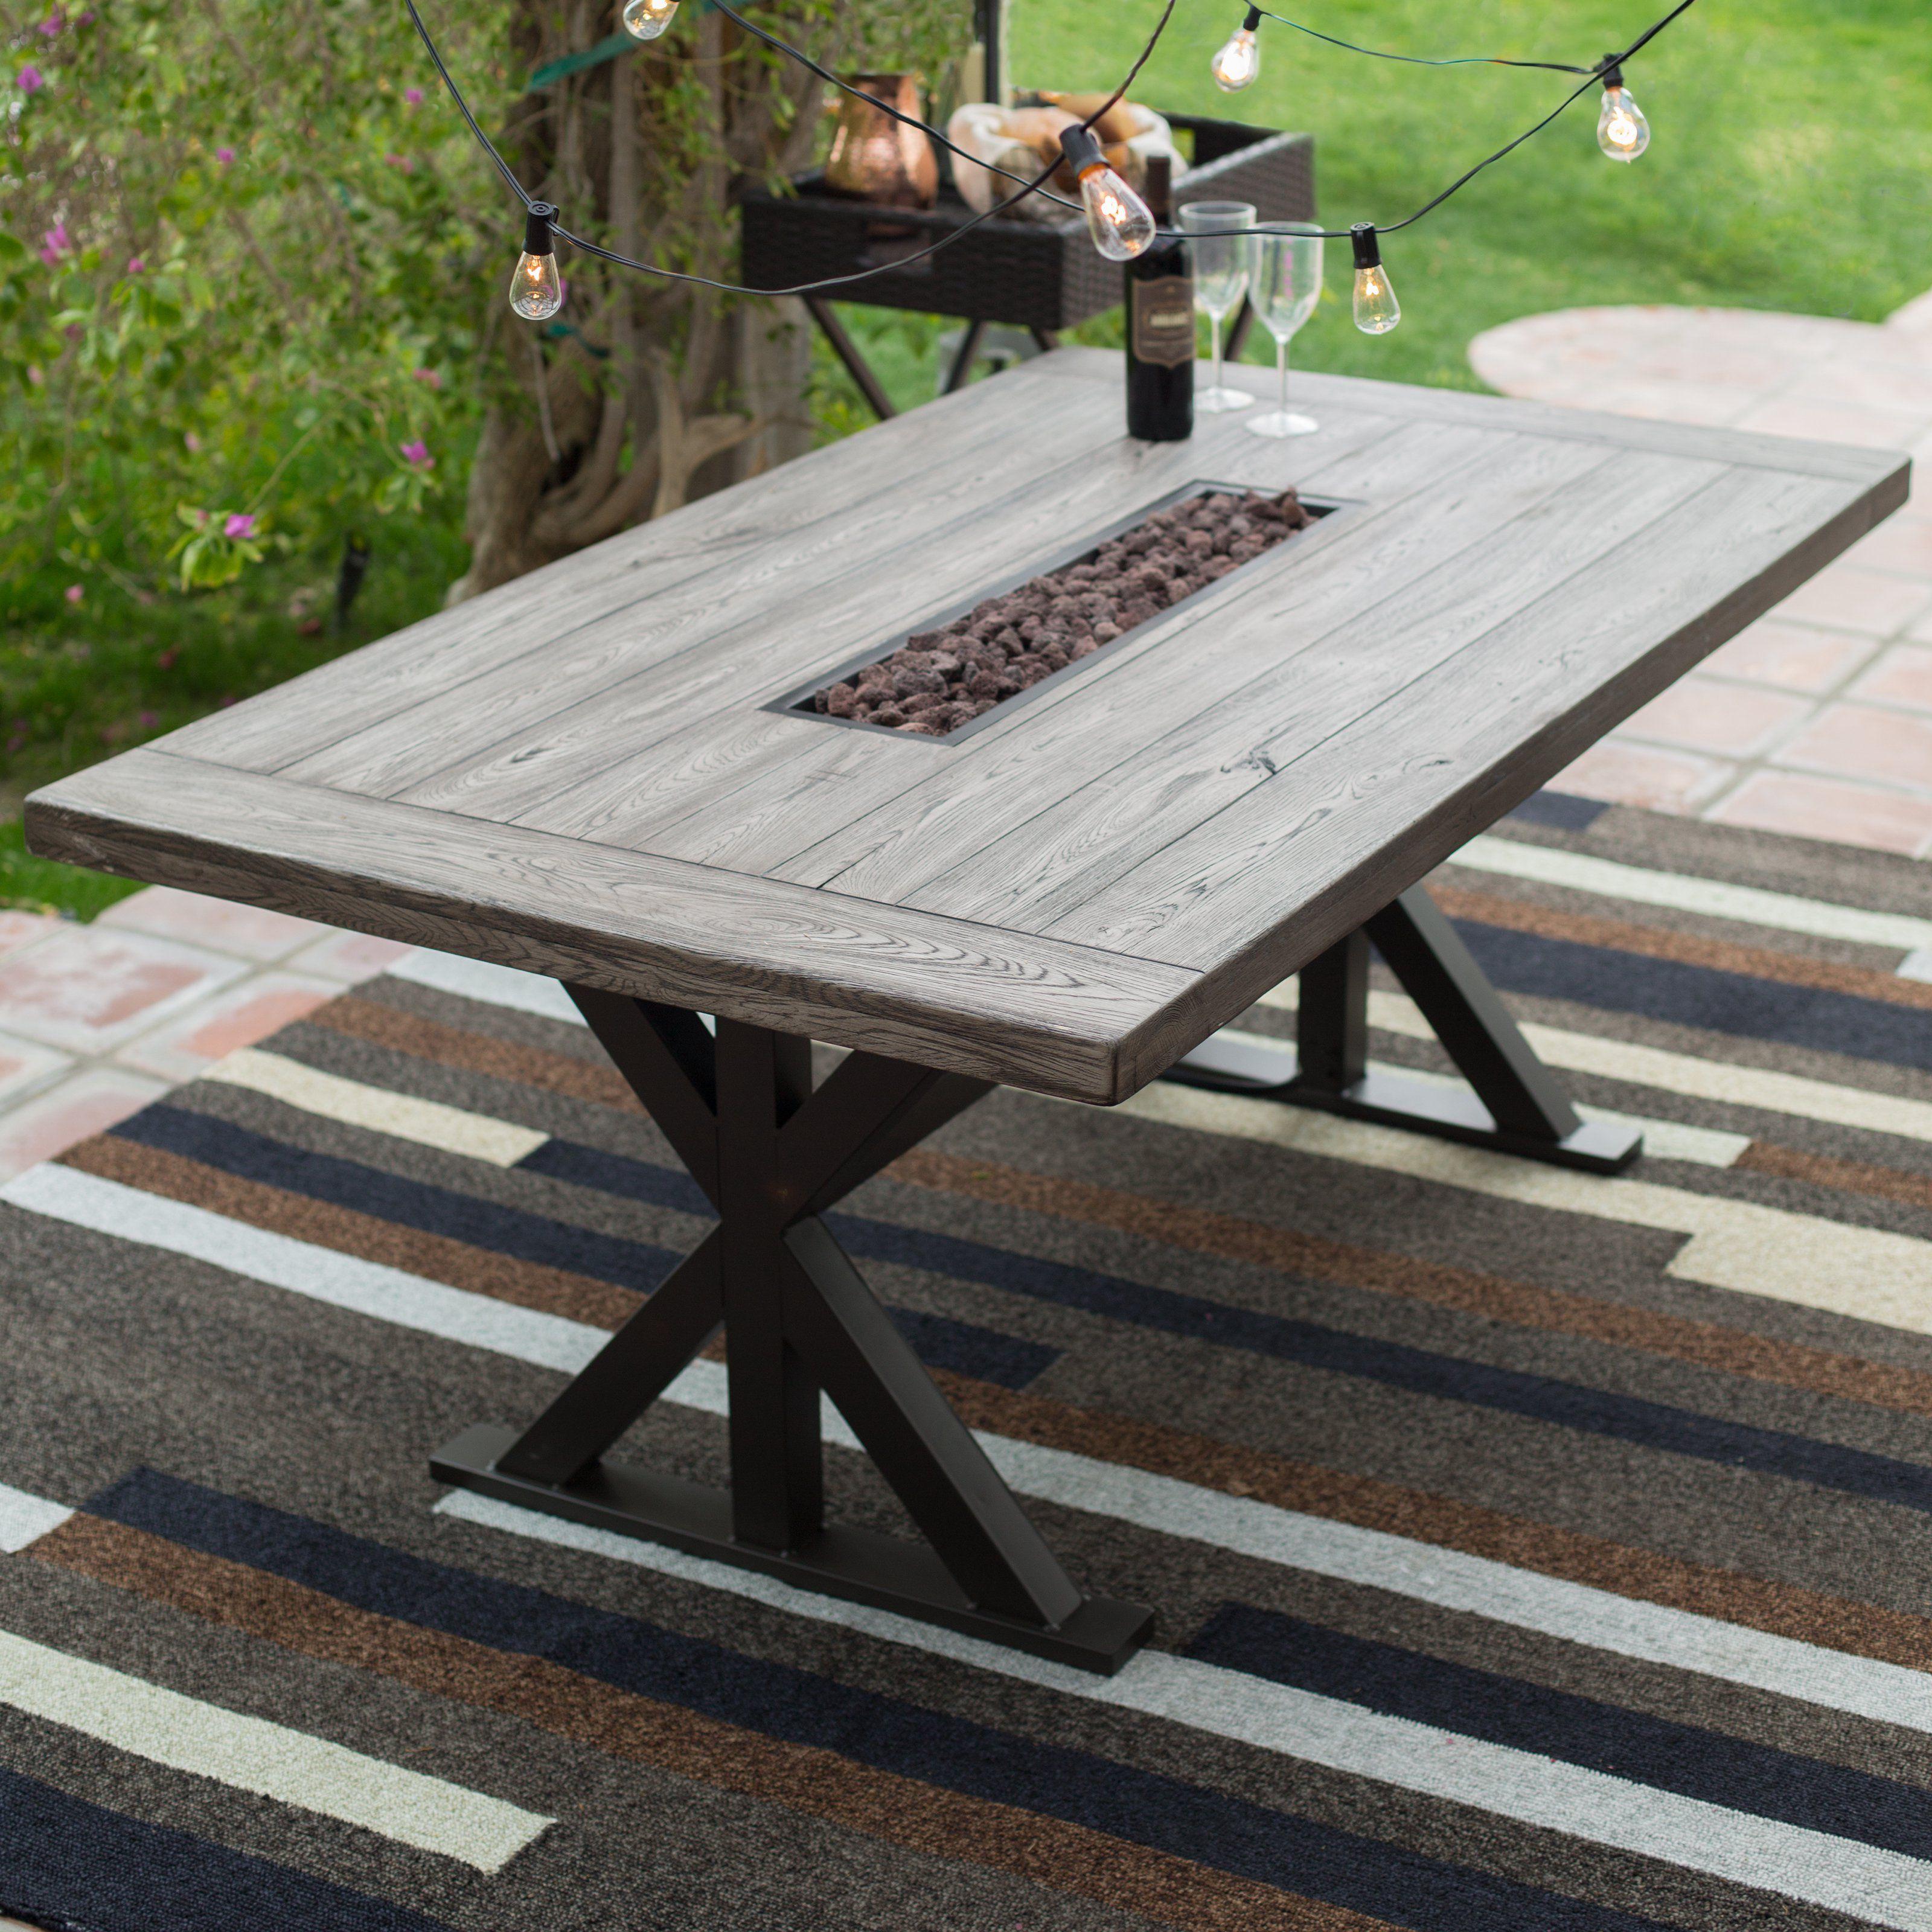 df767f3fccbedf4f56f14adbec8e7b09 Top Result 49 Luxury Outdoor Tabletop Fireplace Photos 2018 Xzw1